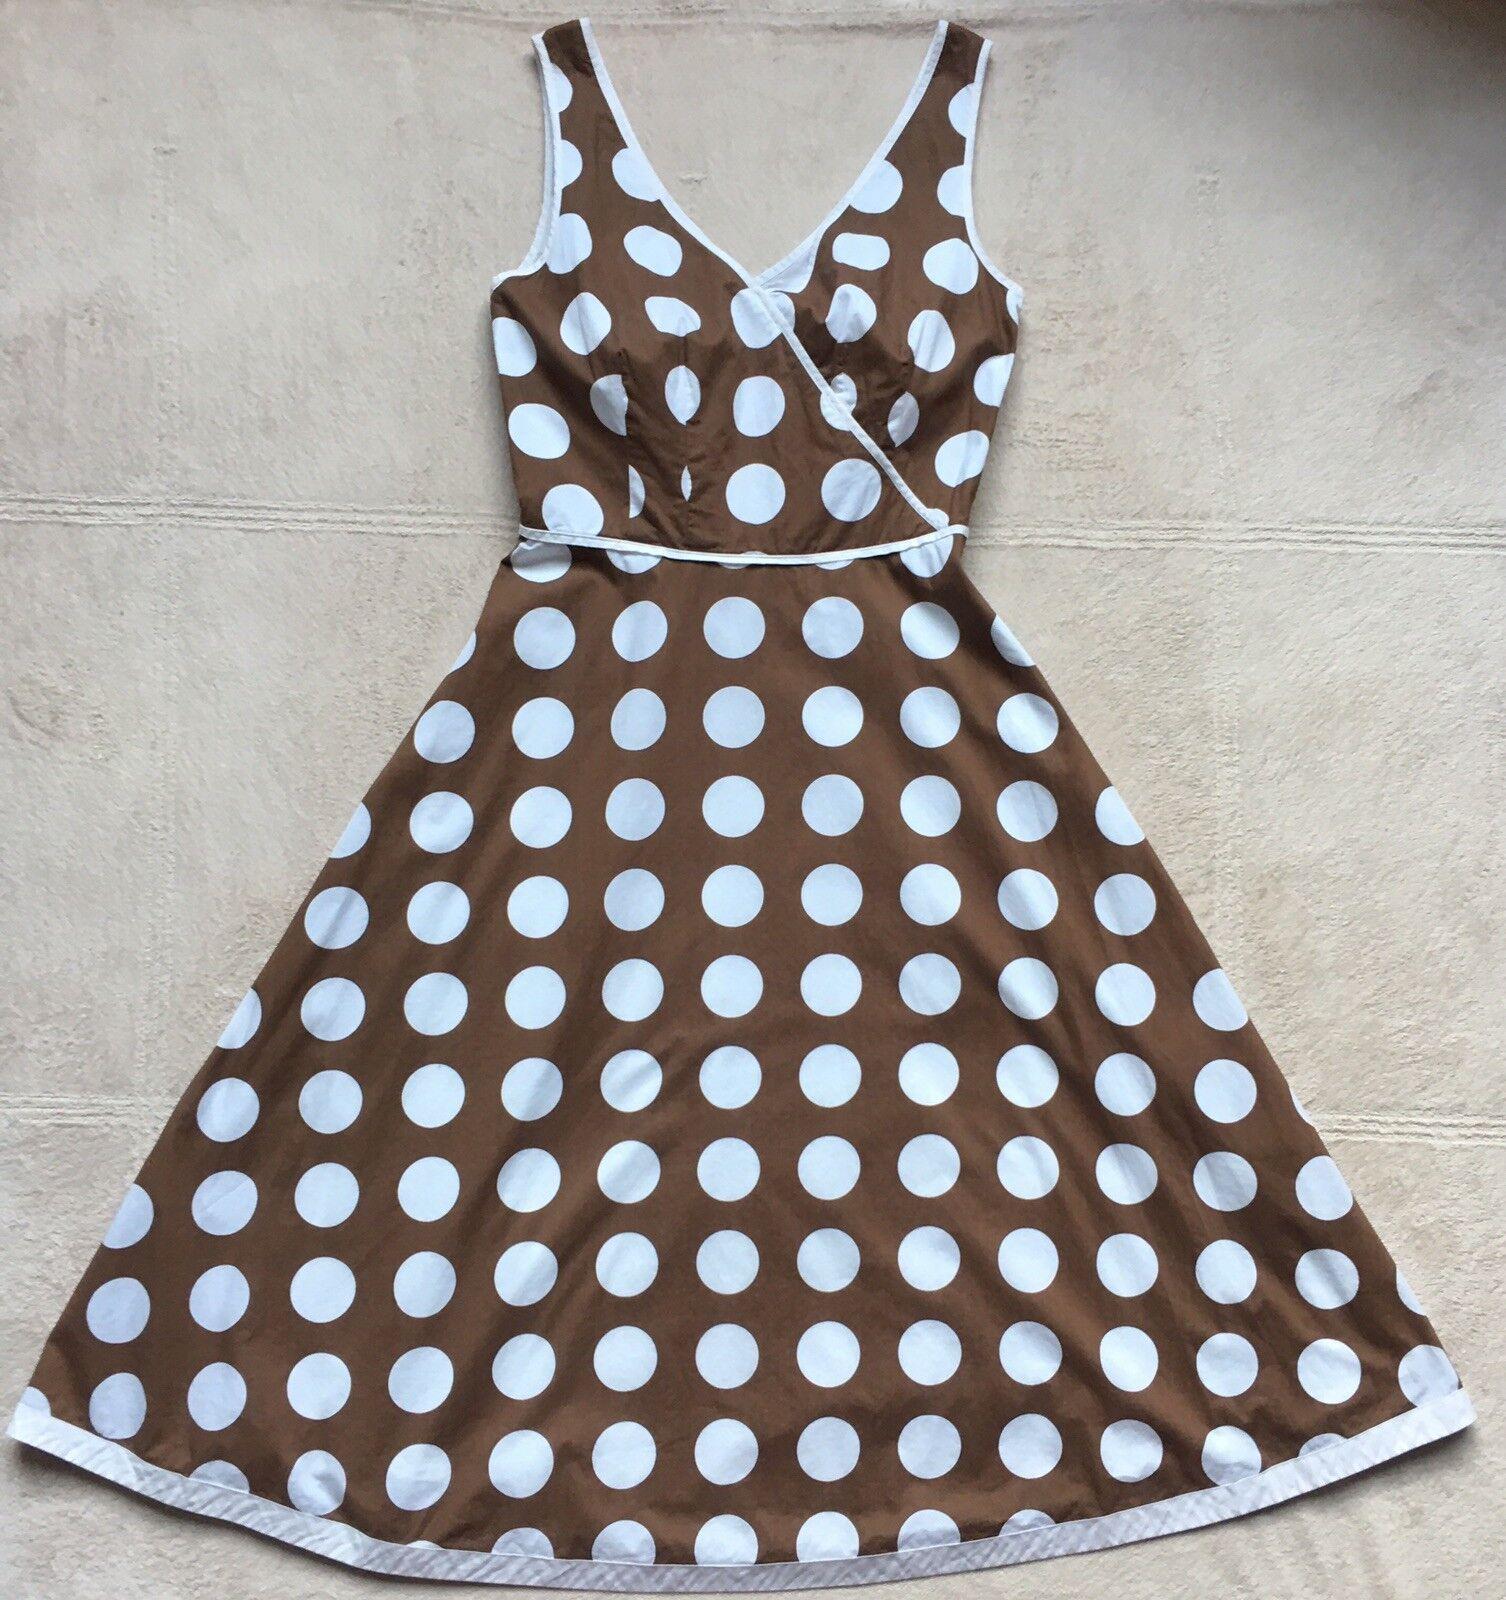 Boden Women's Sleeveless Flare Dress Size 4 Brown & White Polka Dots 100% Cotton